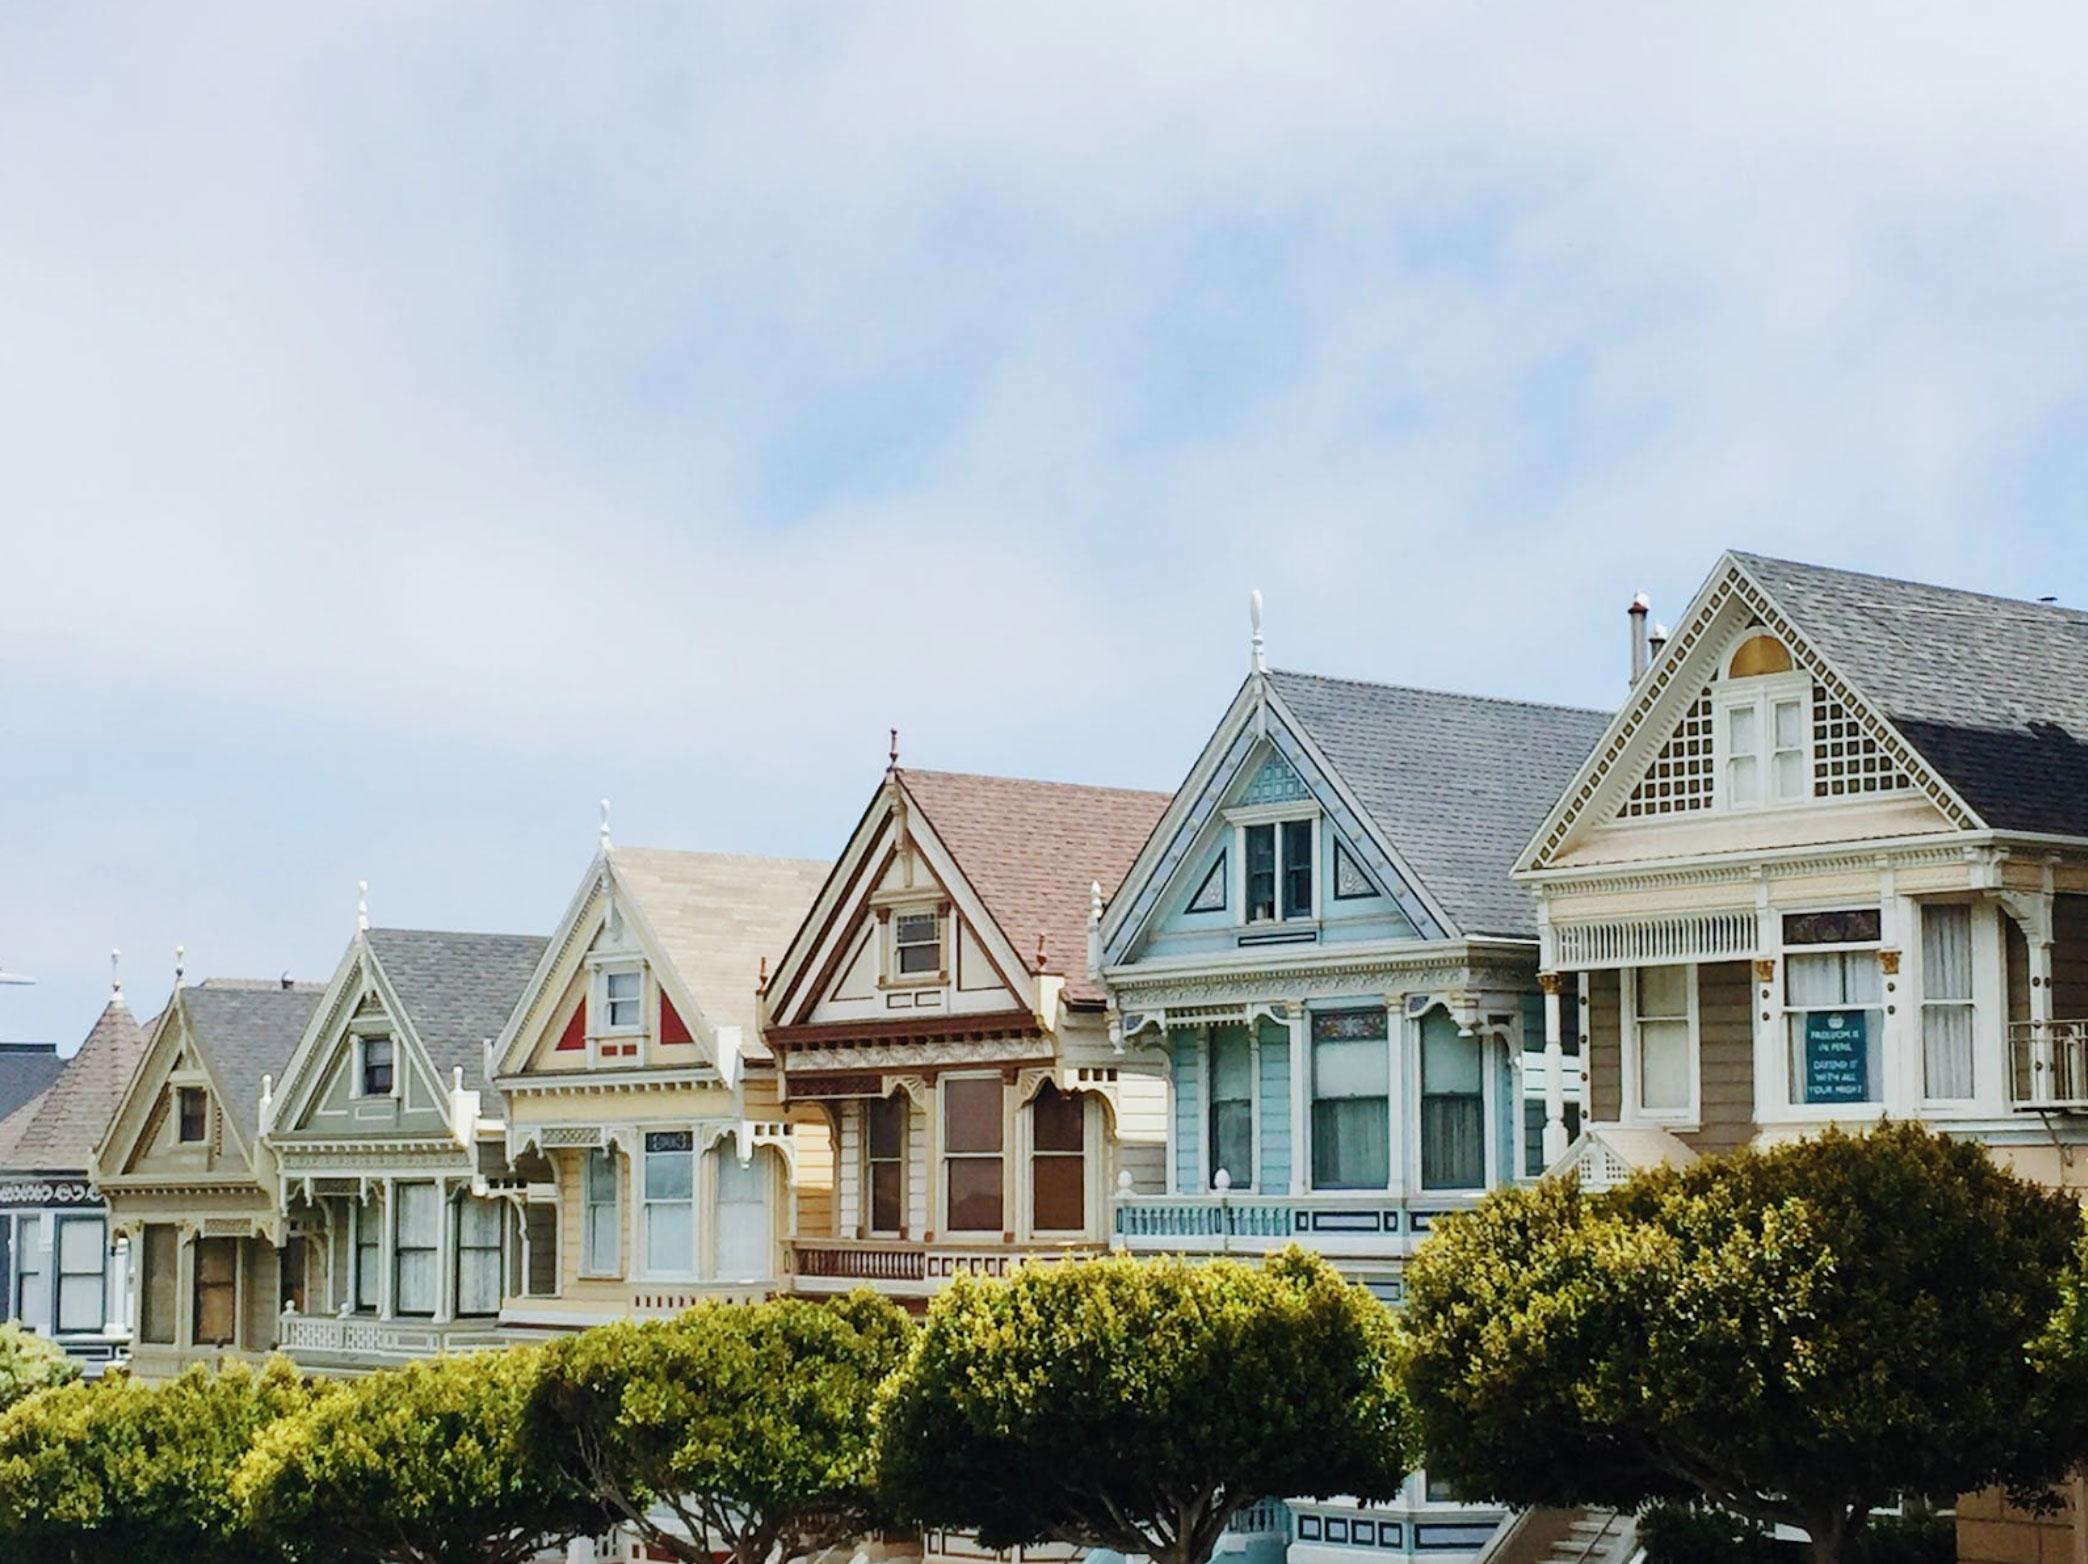 suburban homes under a pale blue sky